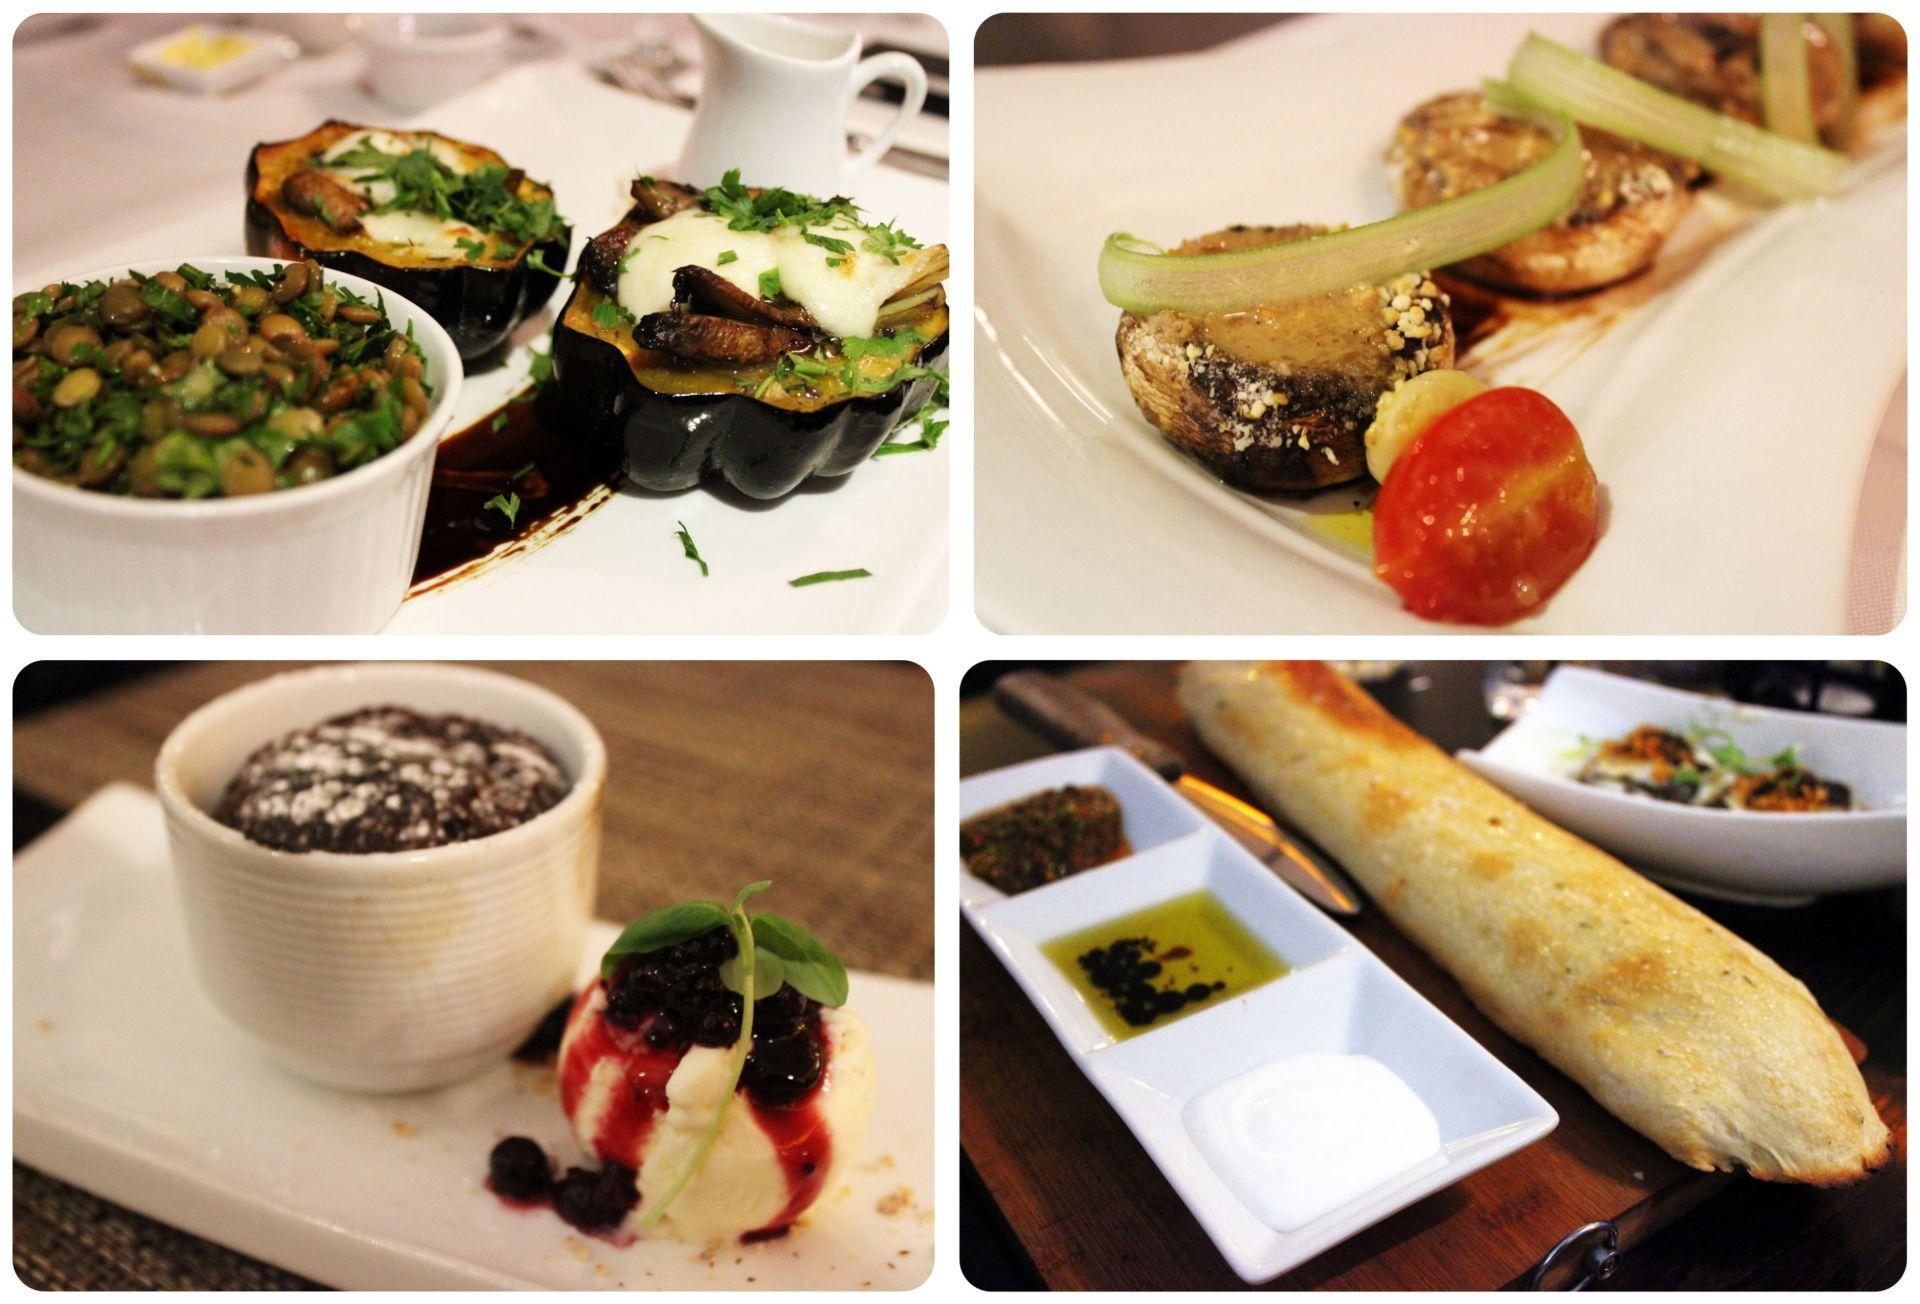 Israel Eilat food